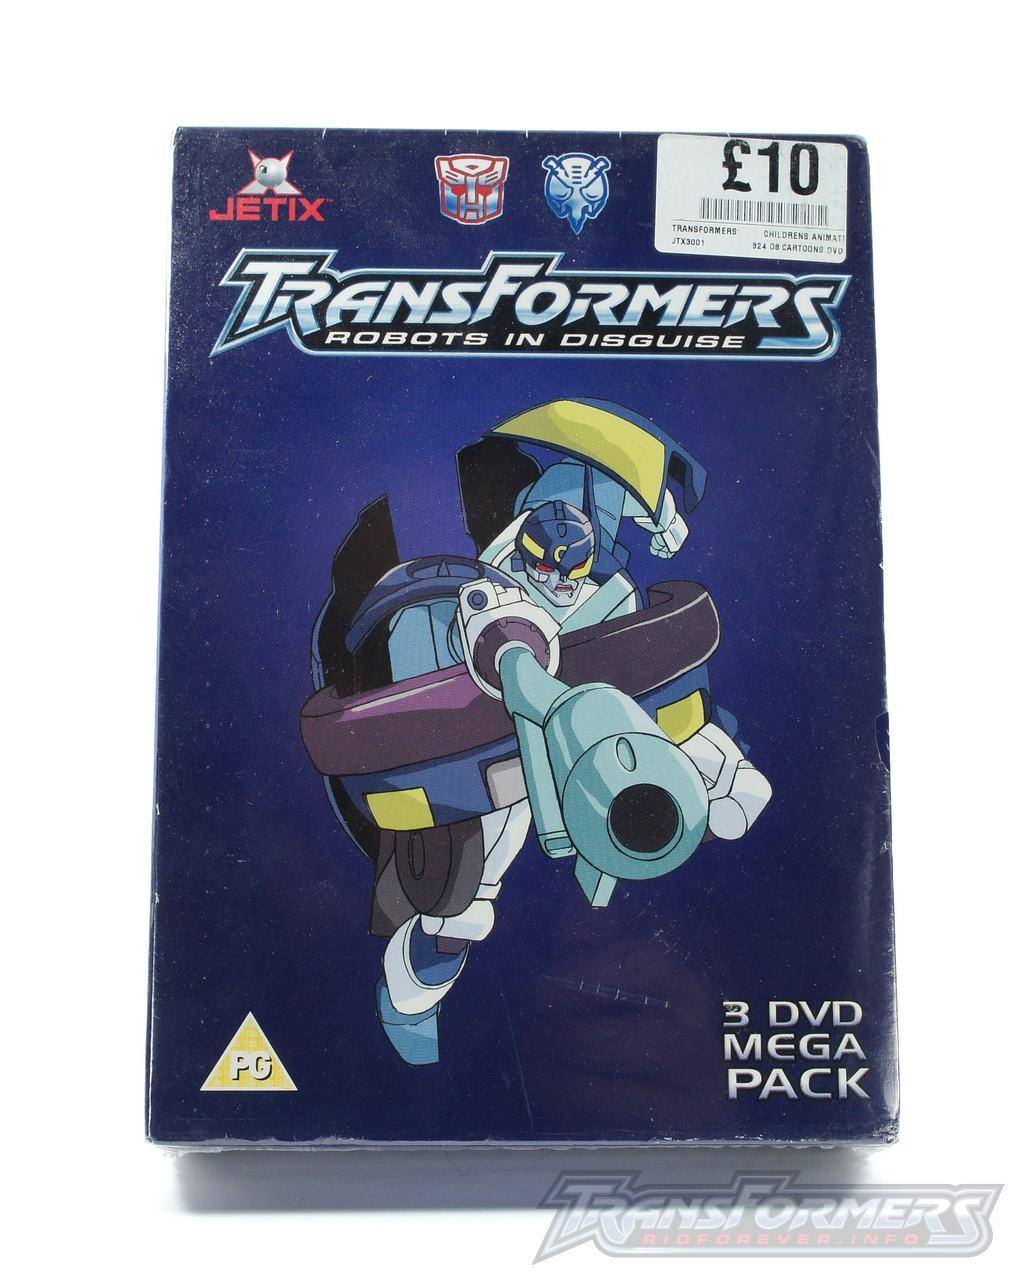 rid-uk-dvd-3dvd-box-front